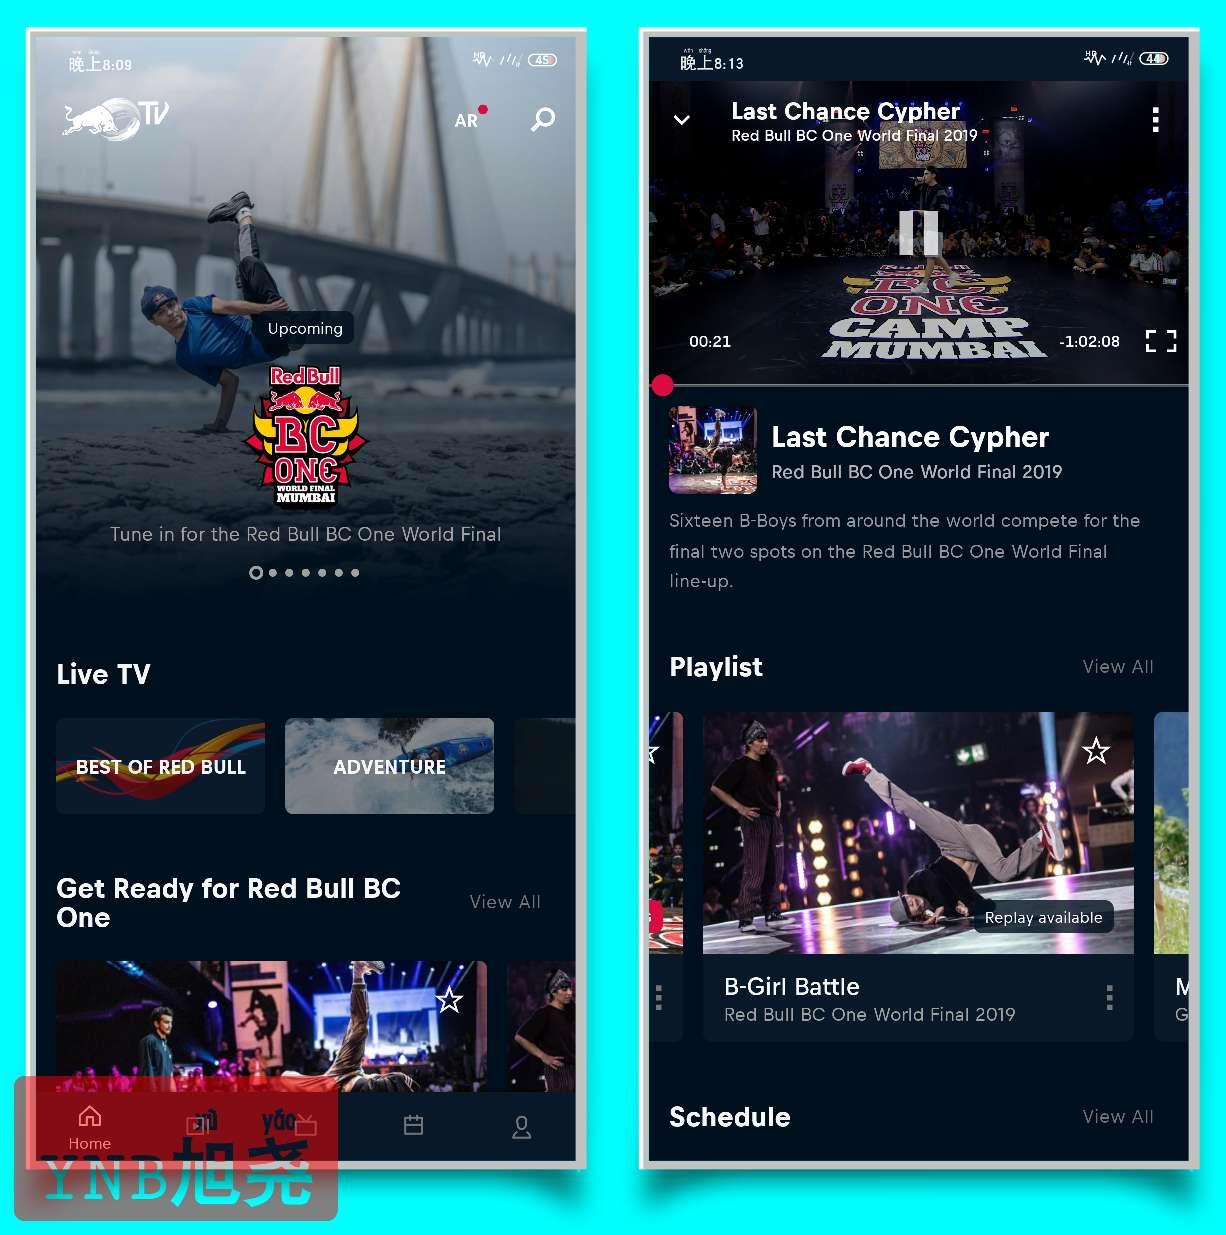 Red Bull TV 红牛电视-最专业的极限运动电视平台